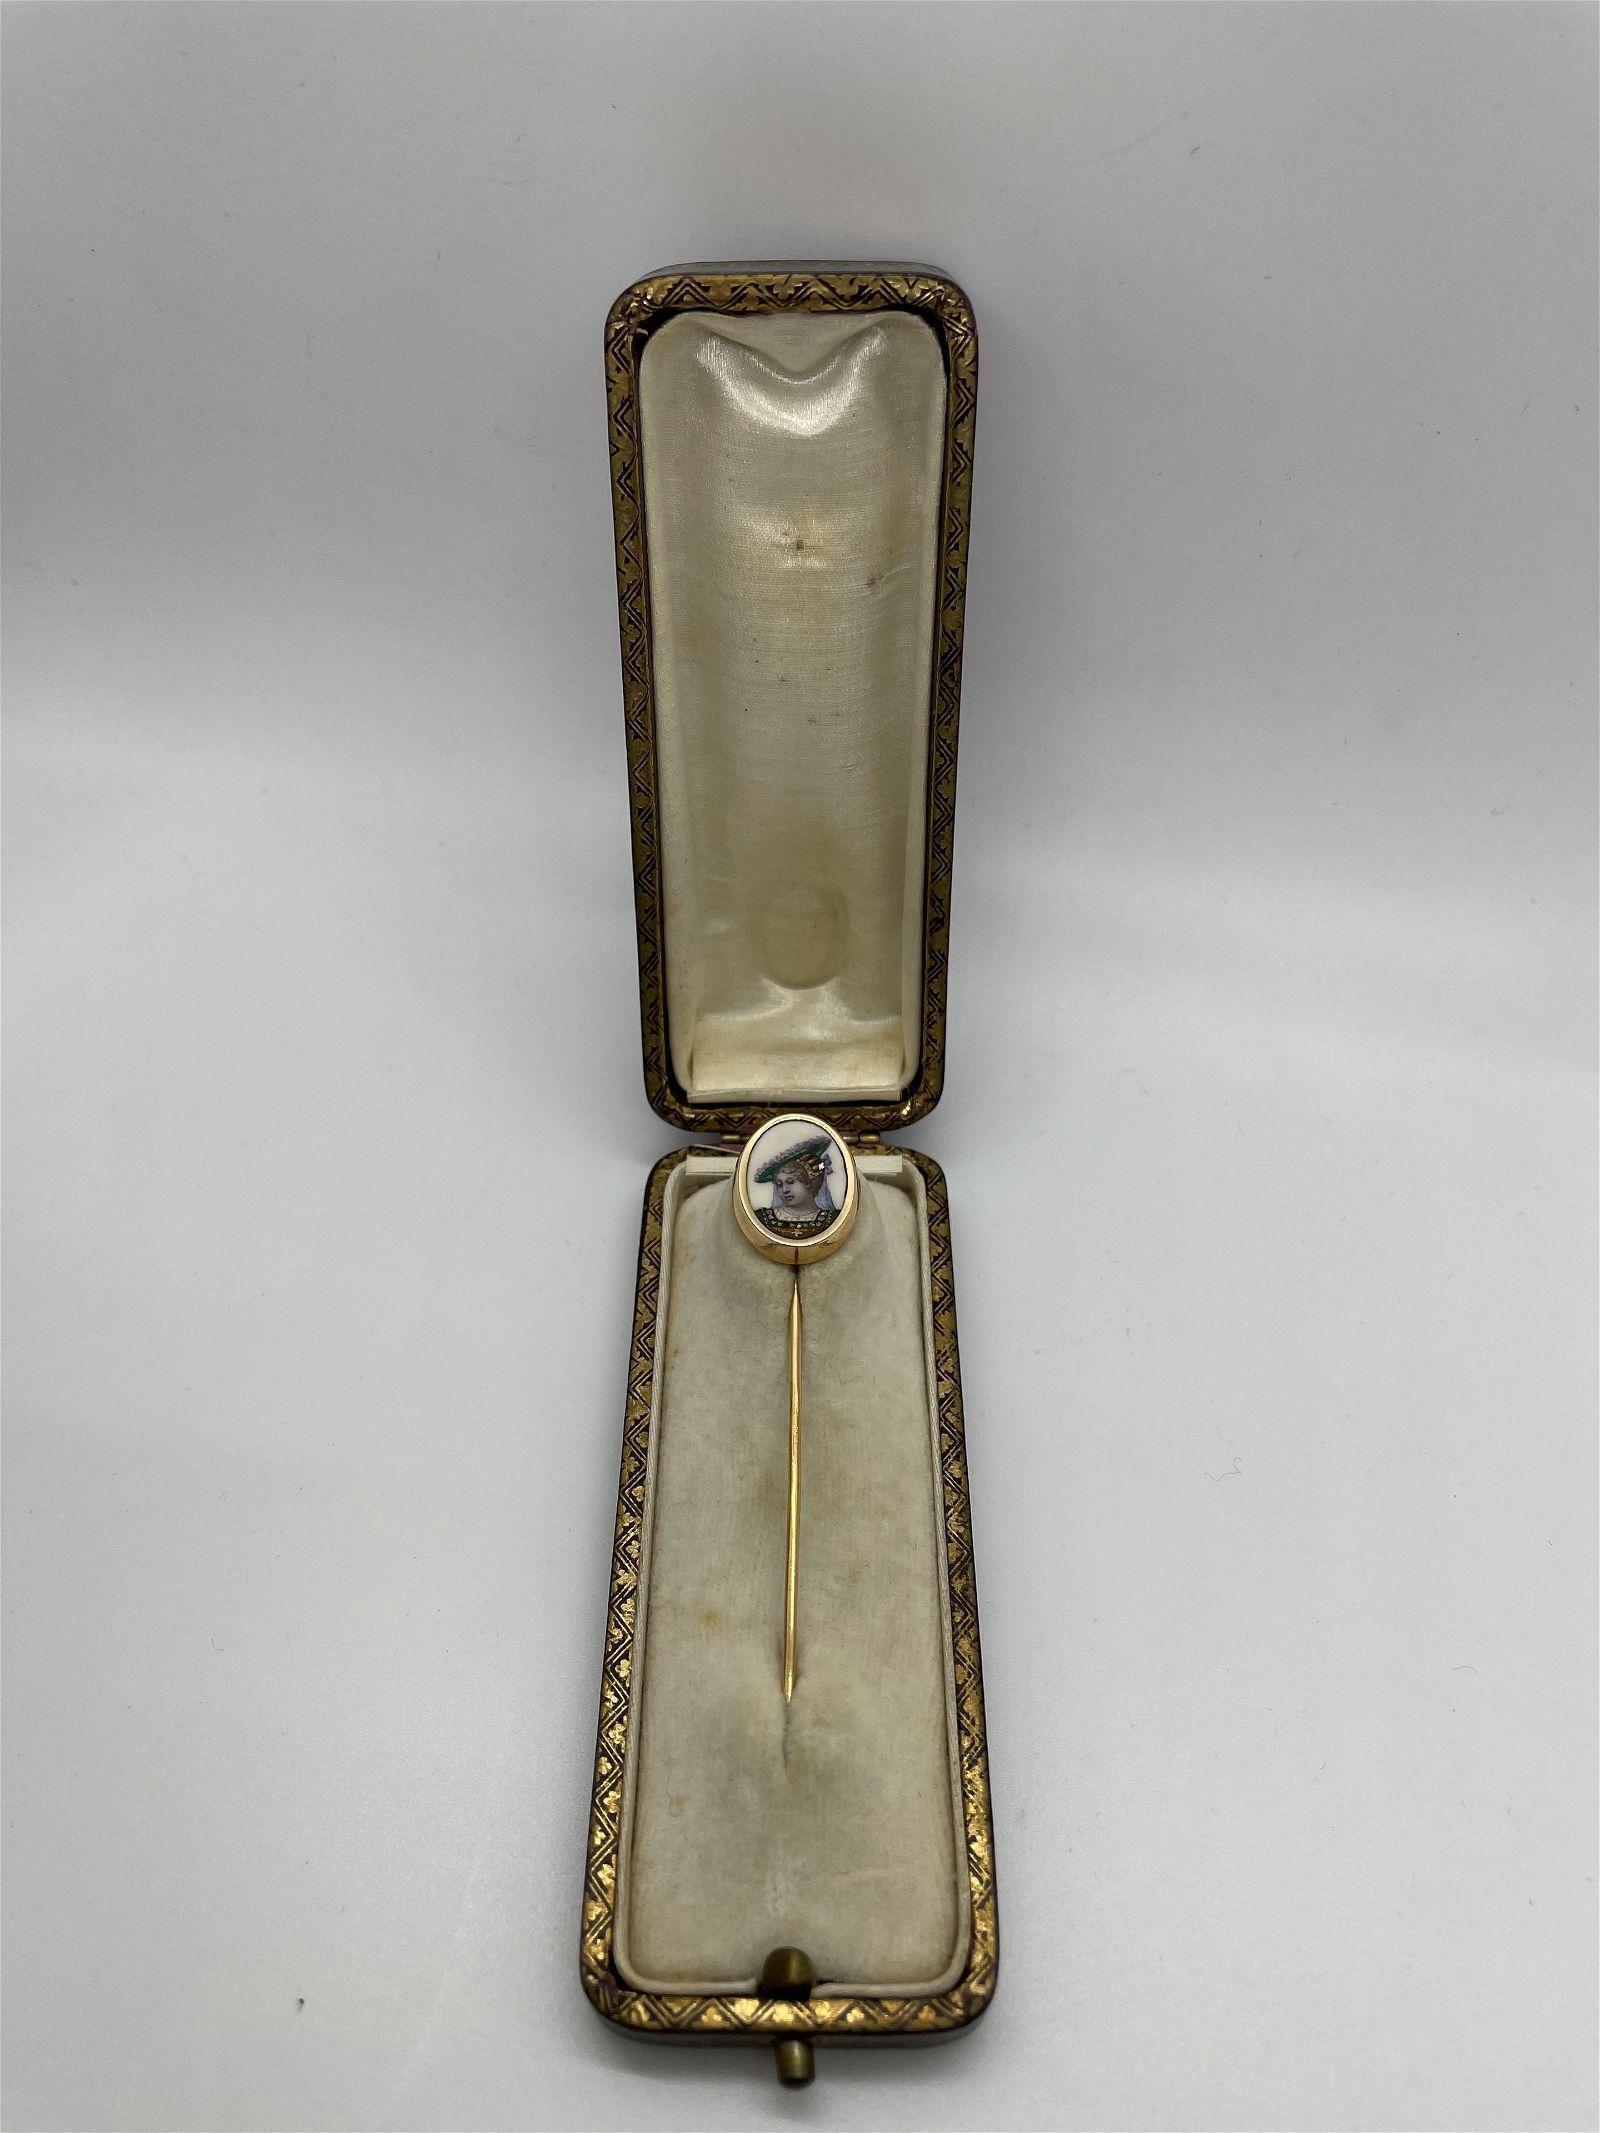 Antique French Enamel Diamond Stick Pin with Box